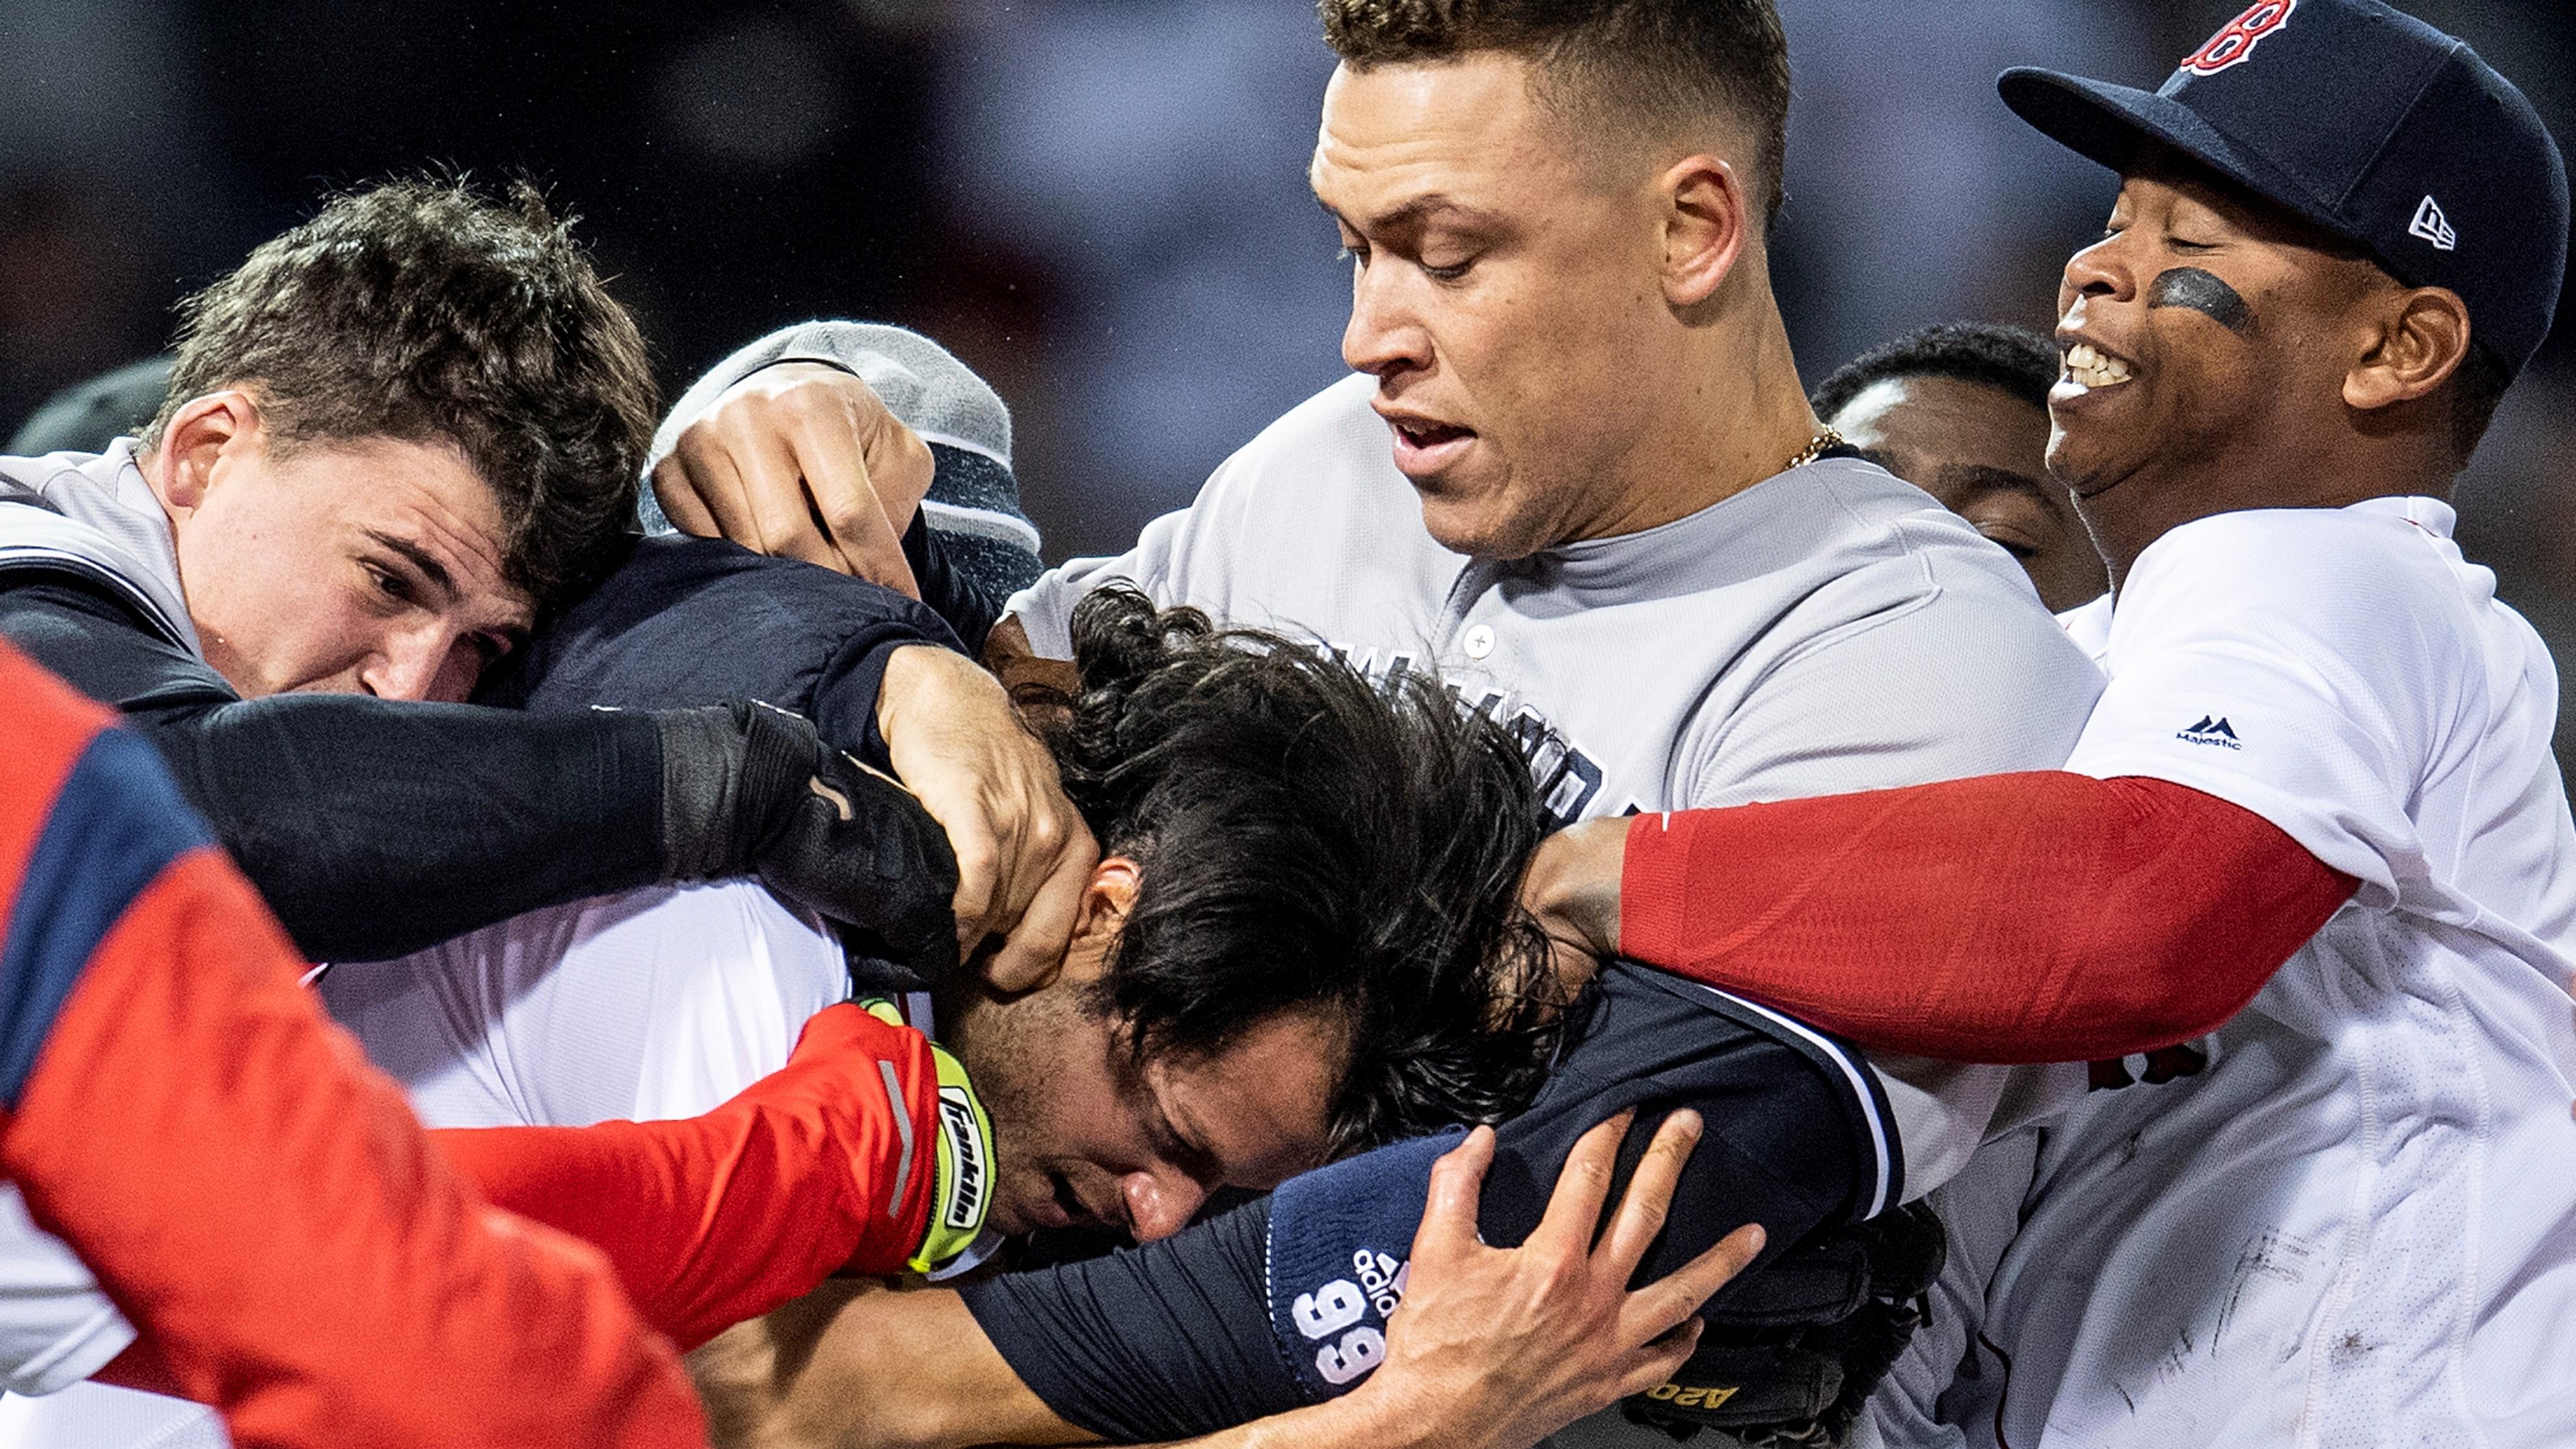 Hot Clicks: Yankees-Red Sox, Rockies-Padres brawls (video)